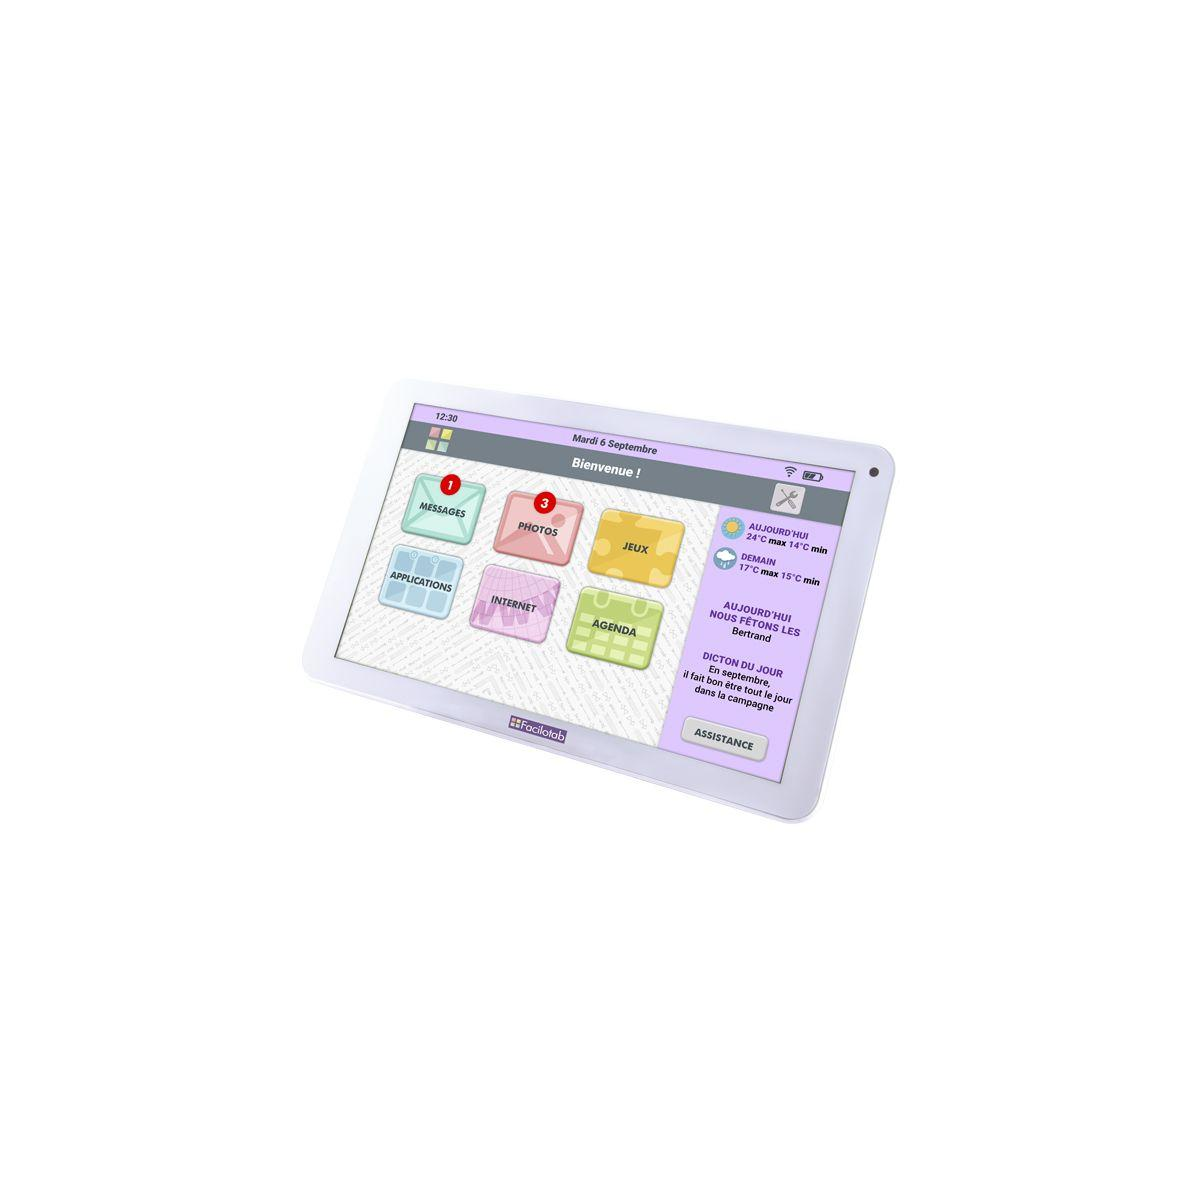 Tablette cdip facilotab 32go 10.1'' blan - 3% de remise immédiate avec le code : multi3 (photo)